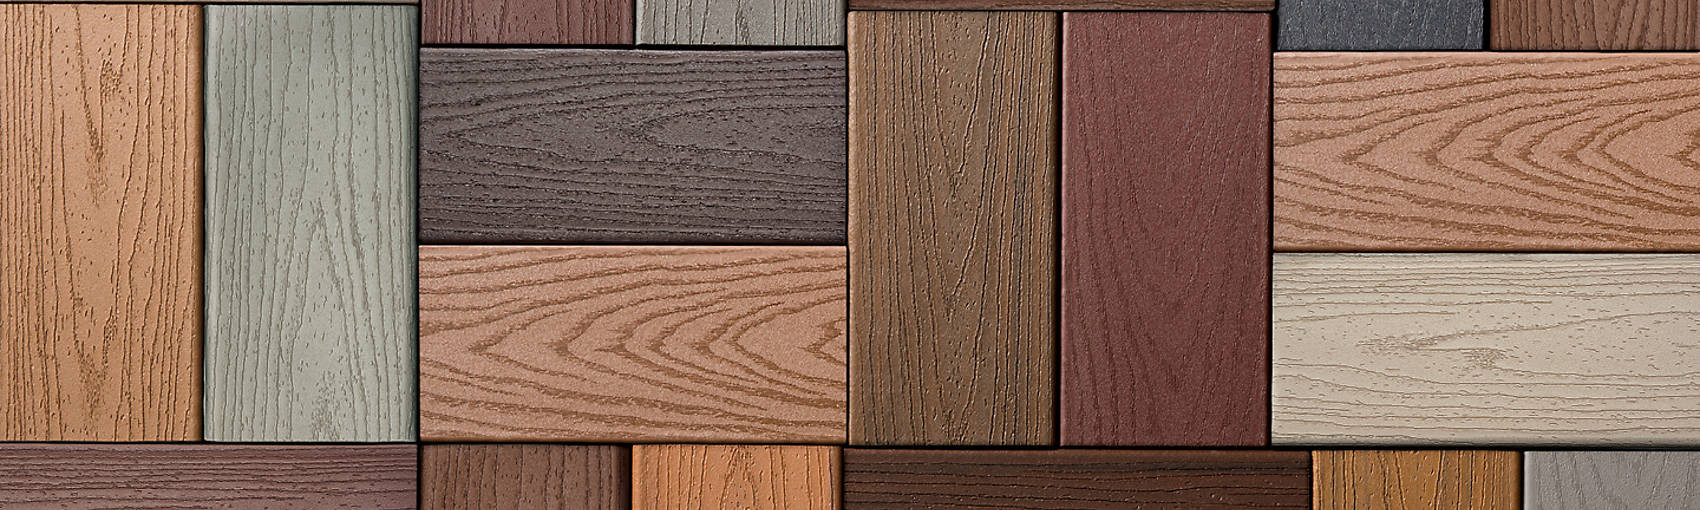 vintage hardwood flooring halifax ns of composite decking composite deck materials trex for trex color selector hero 2